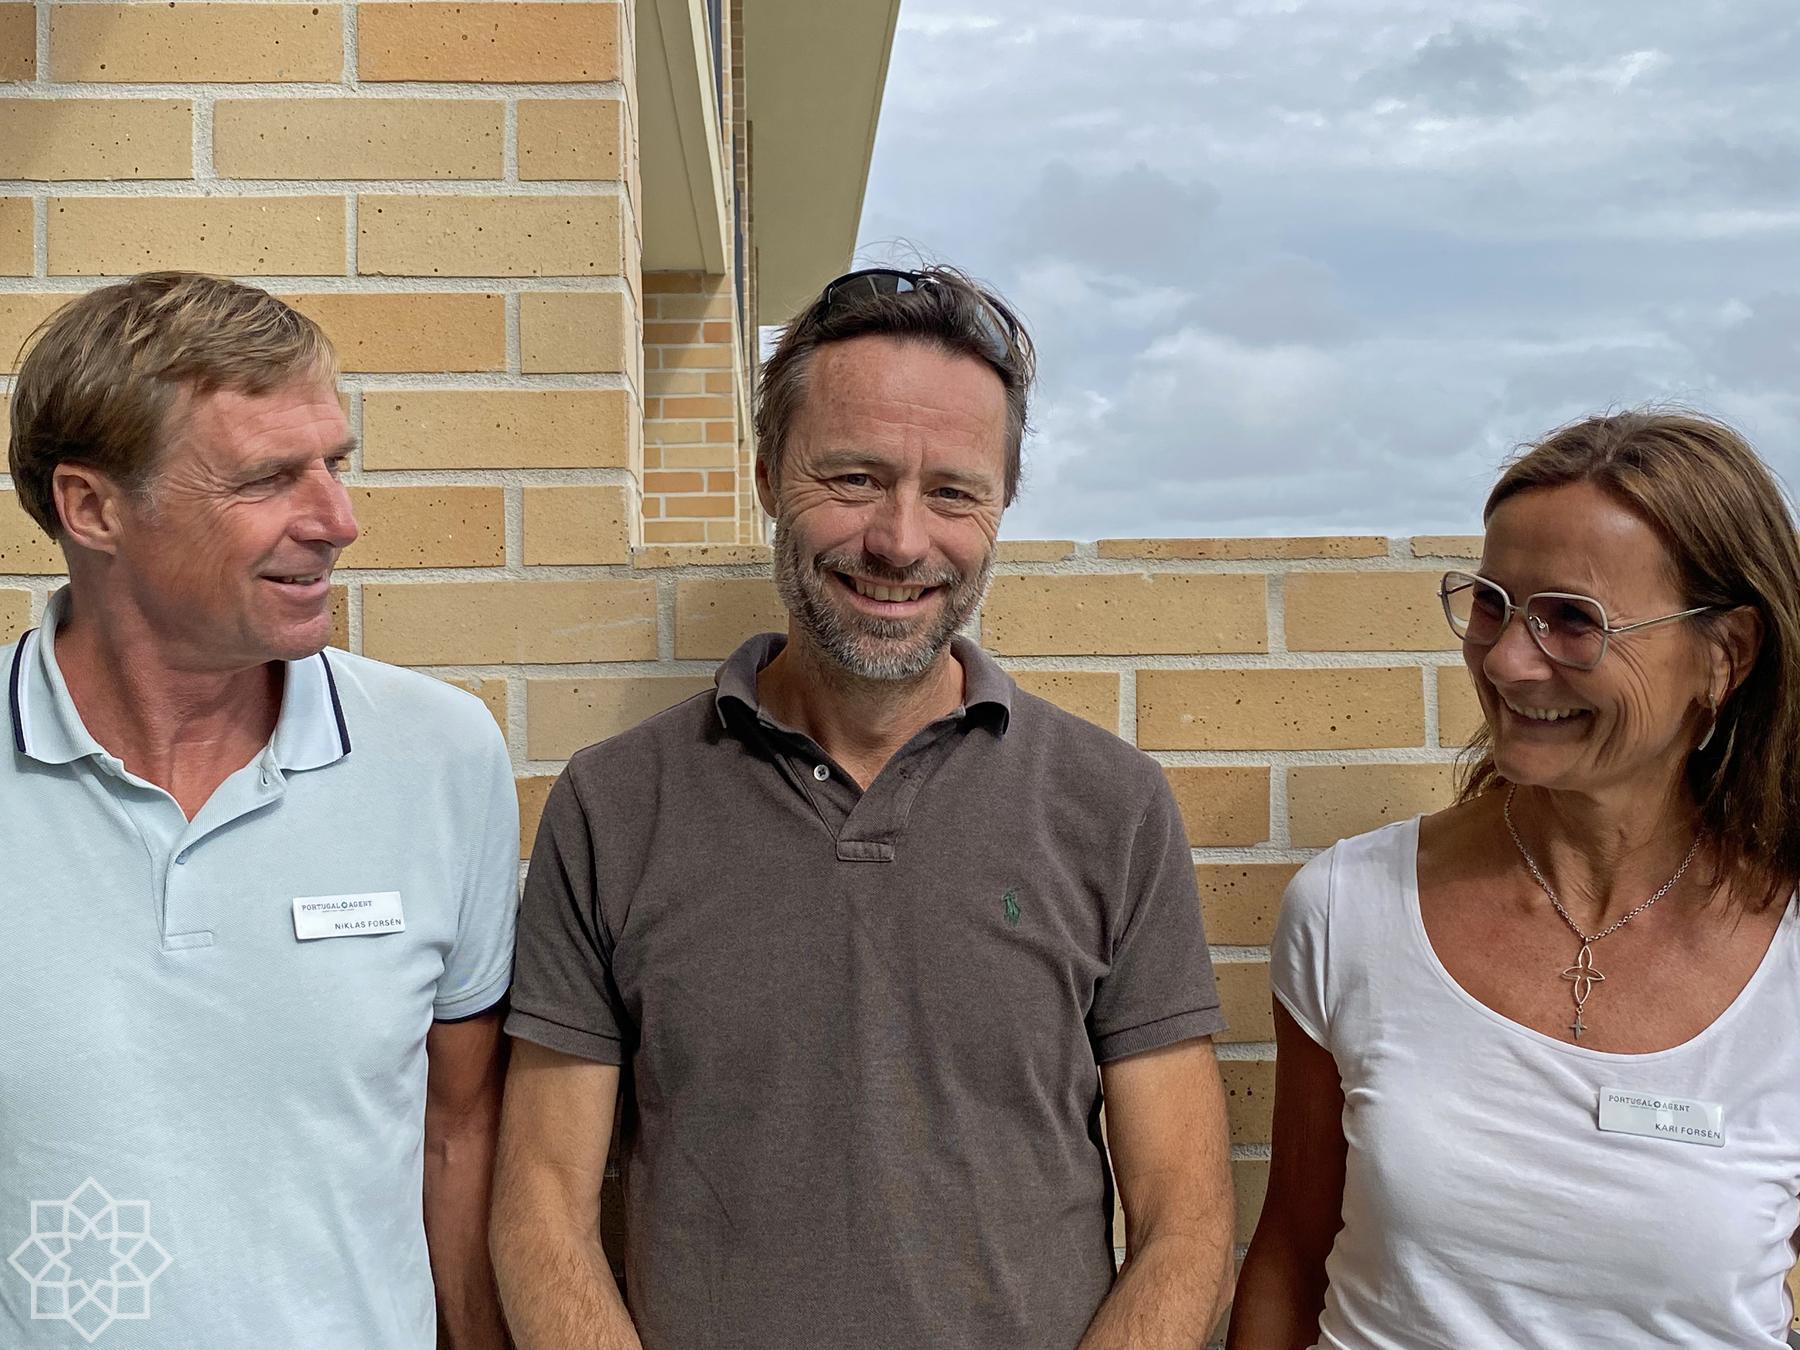 Niklas, Jörgen and Kari